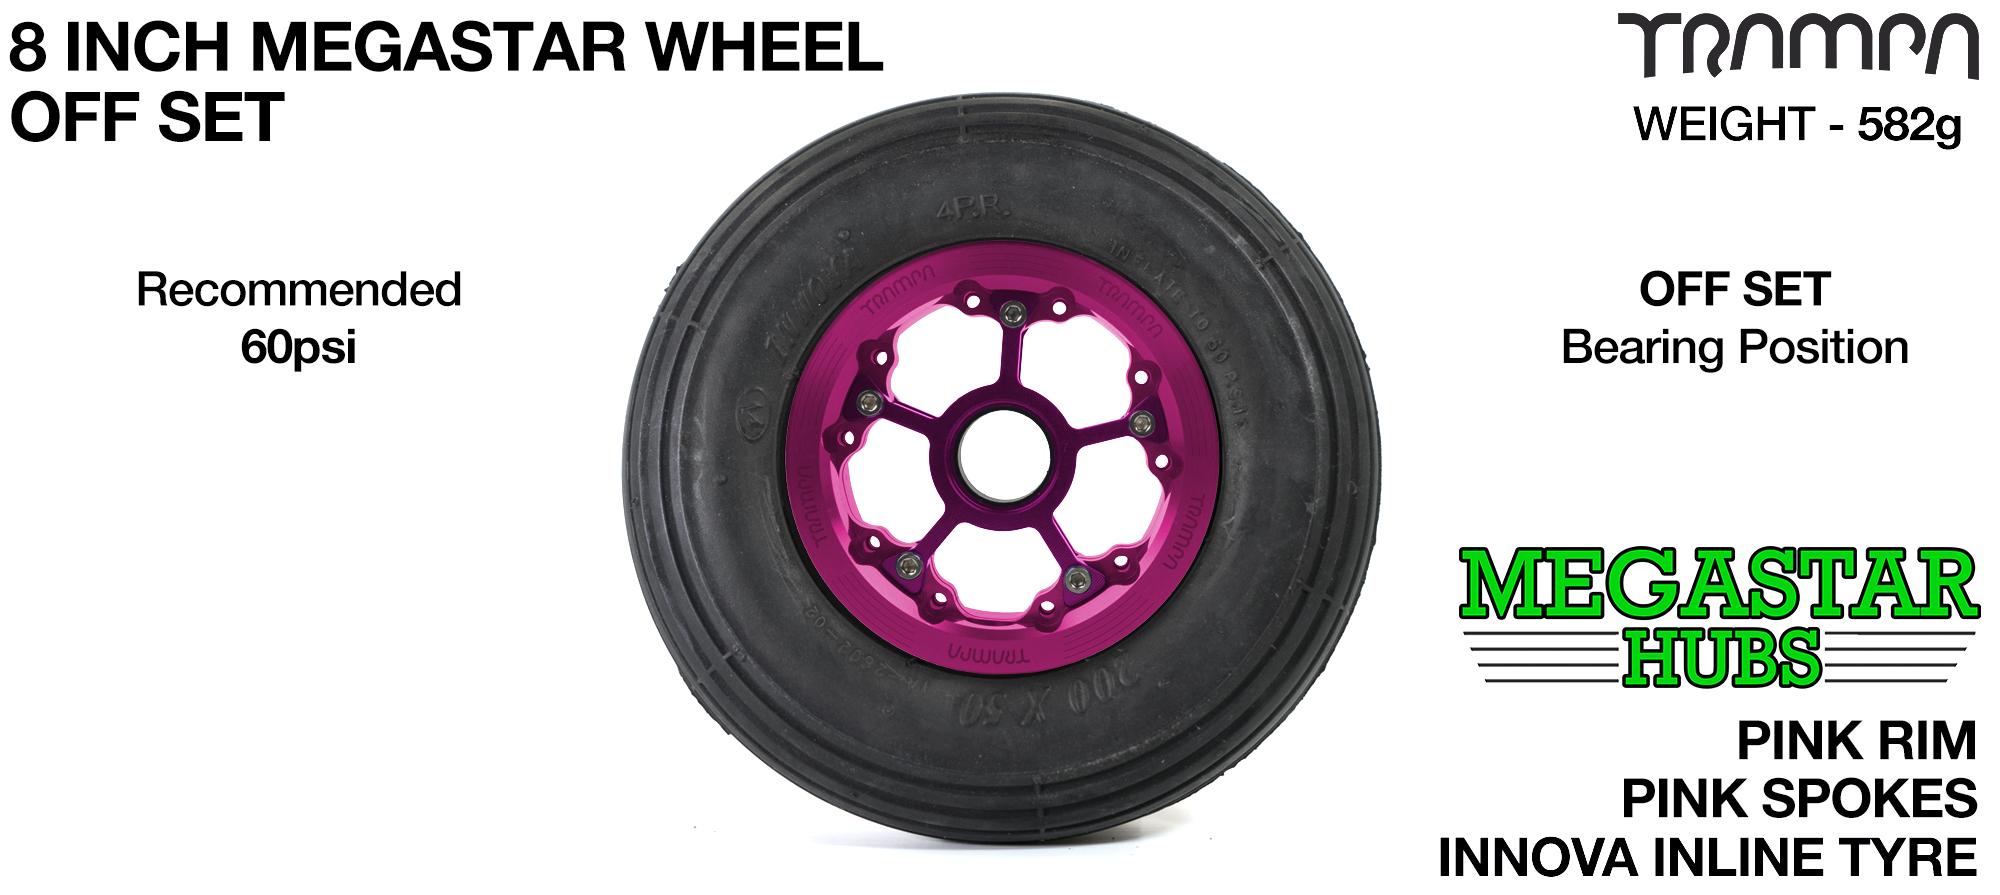 "PINK MEGASTAR Rims with PINK Spokes & 8"" INLINE Tyres"